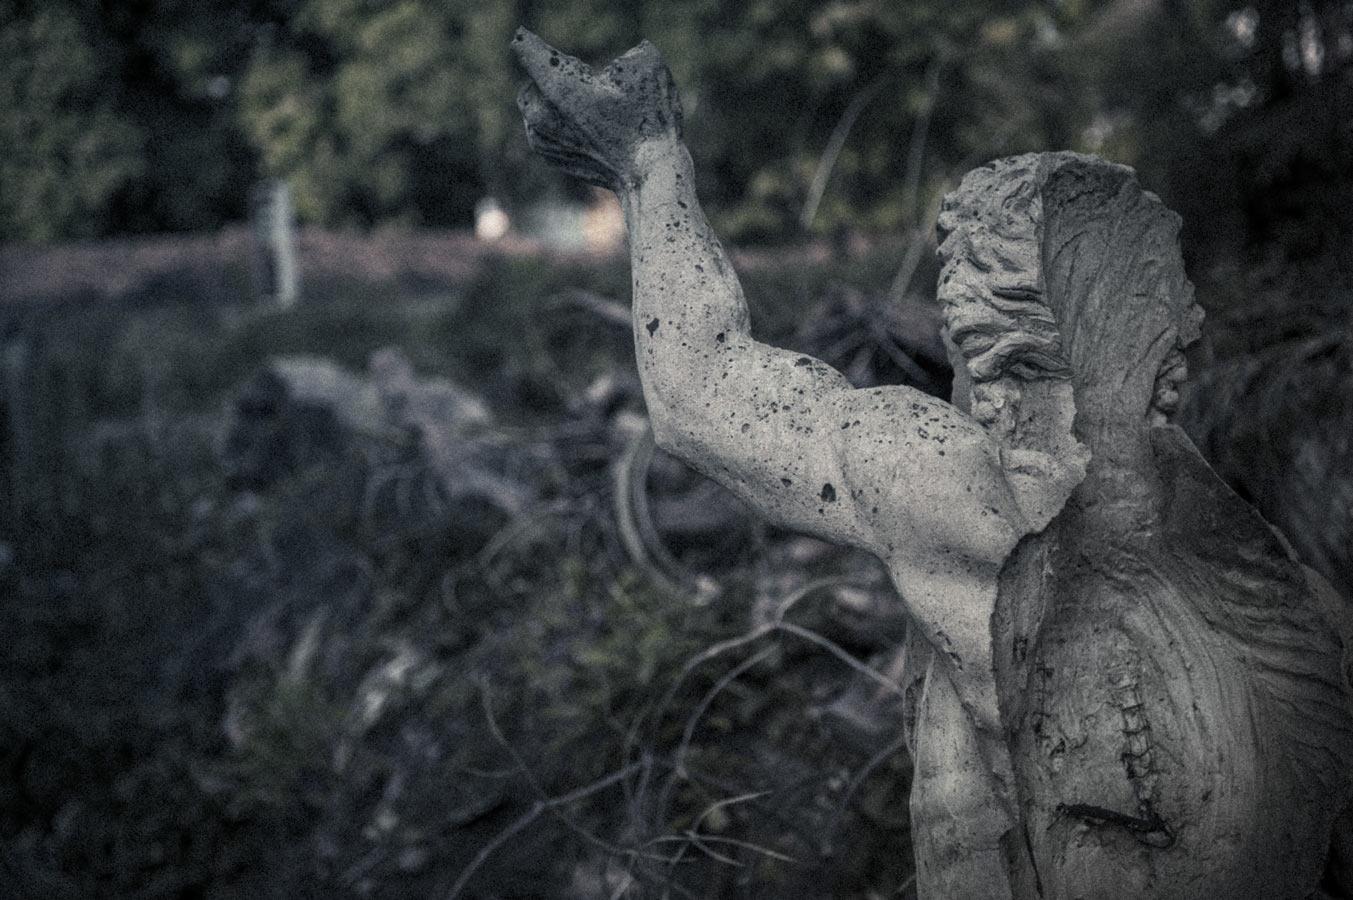 Jamie-Lowe-Photography-Haunted-House-Chiang-Mai-25.jpg